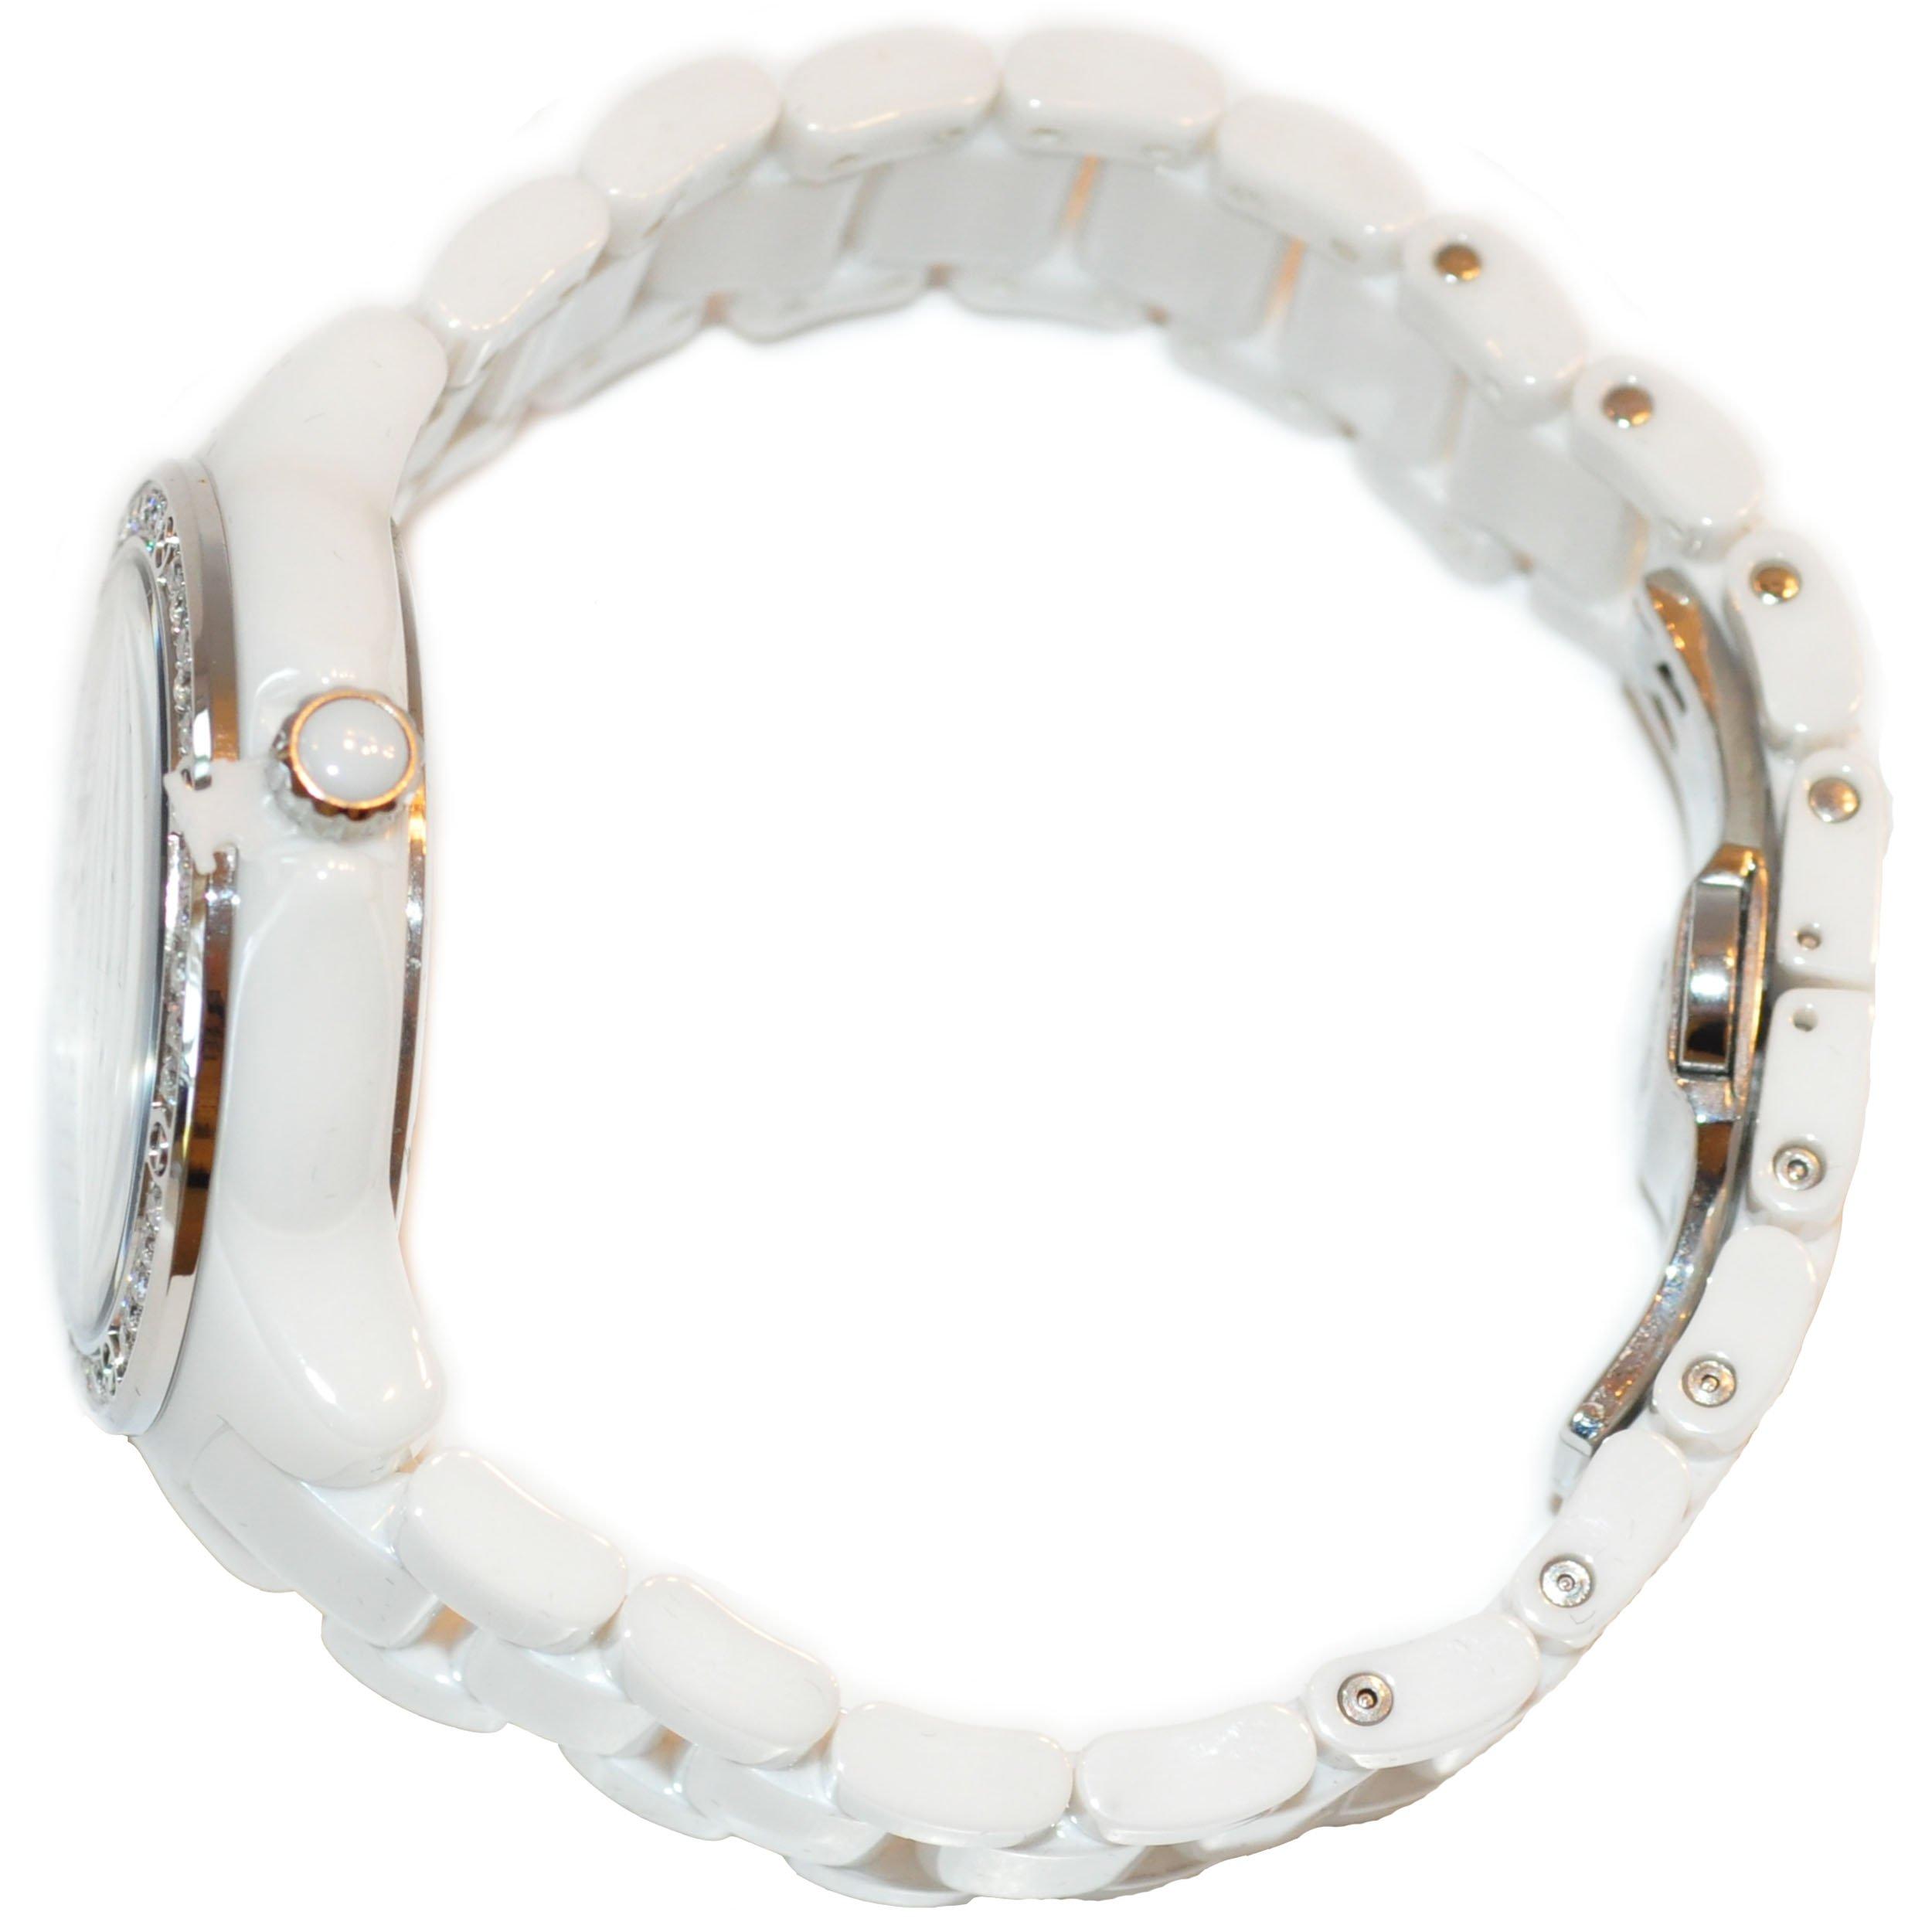 Ed Hardy Dreamer Love Kills Slowly Swarovski Crystal/ceramic Watch, Dm-lk by Ed Hardy (Image #1)